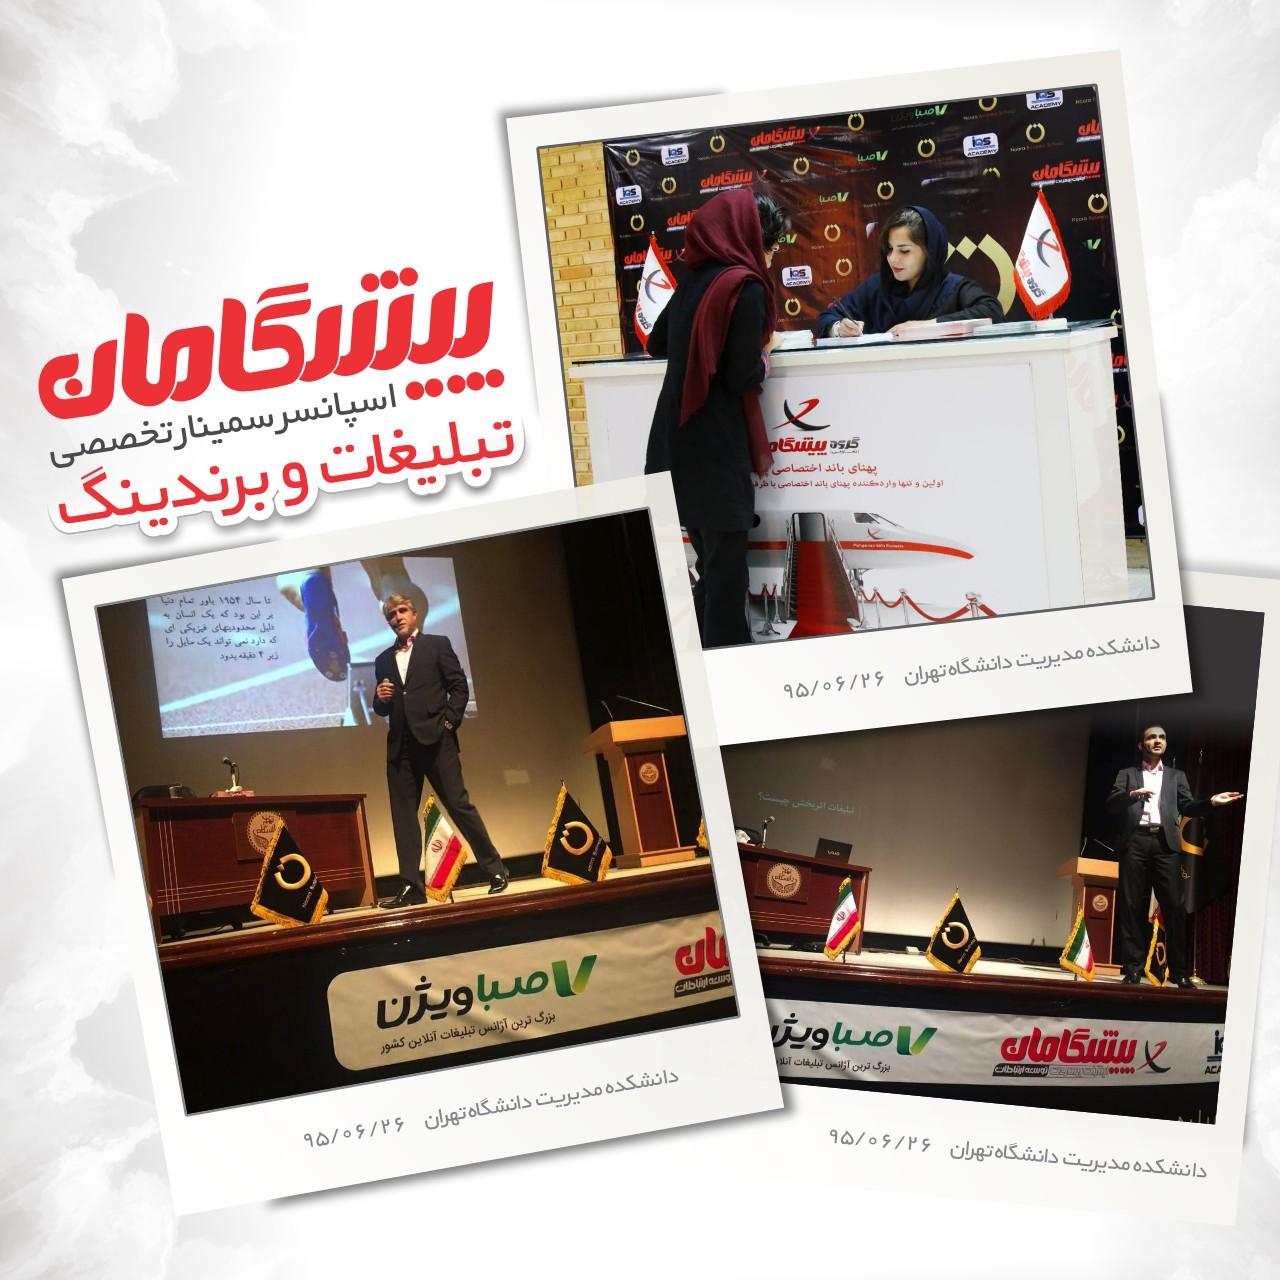 95-06-27 Seminar sponsor advertising and branding (1280x1280px) Final